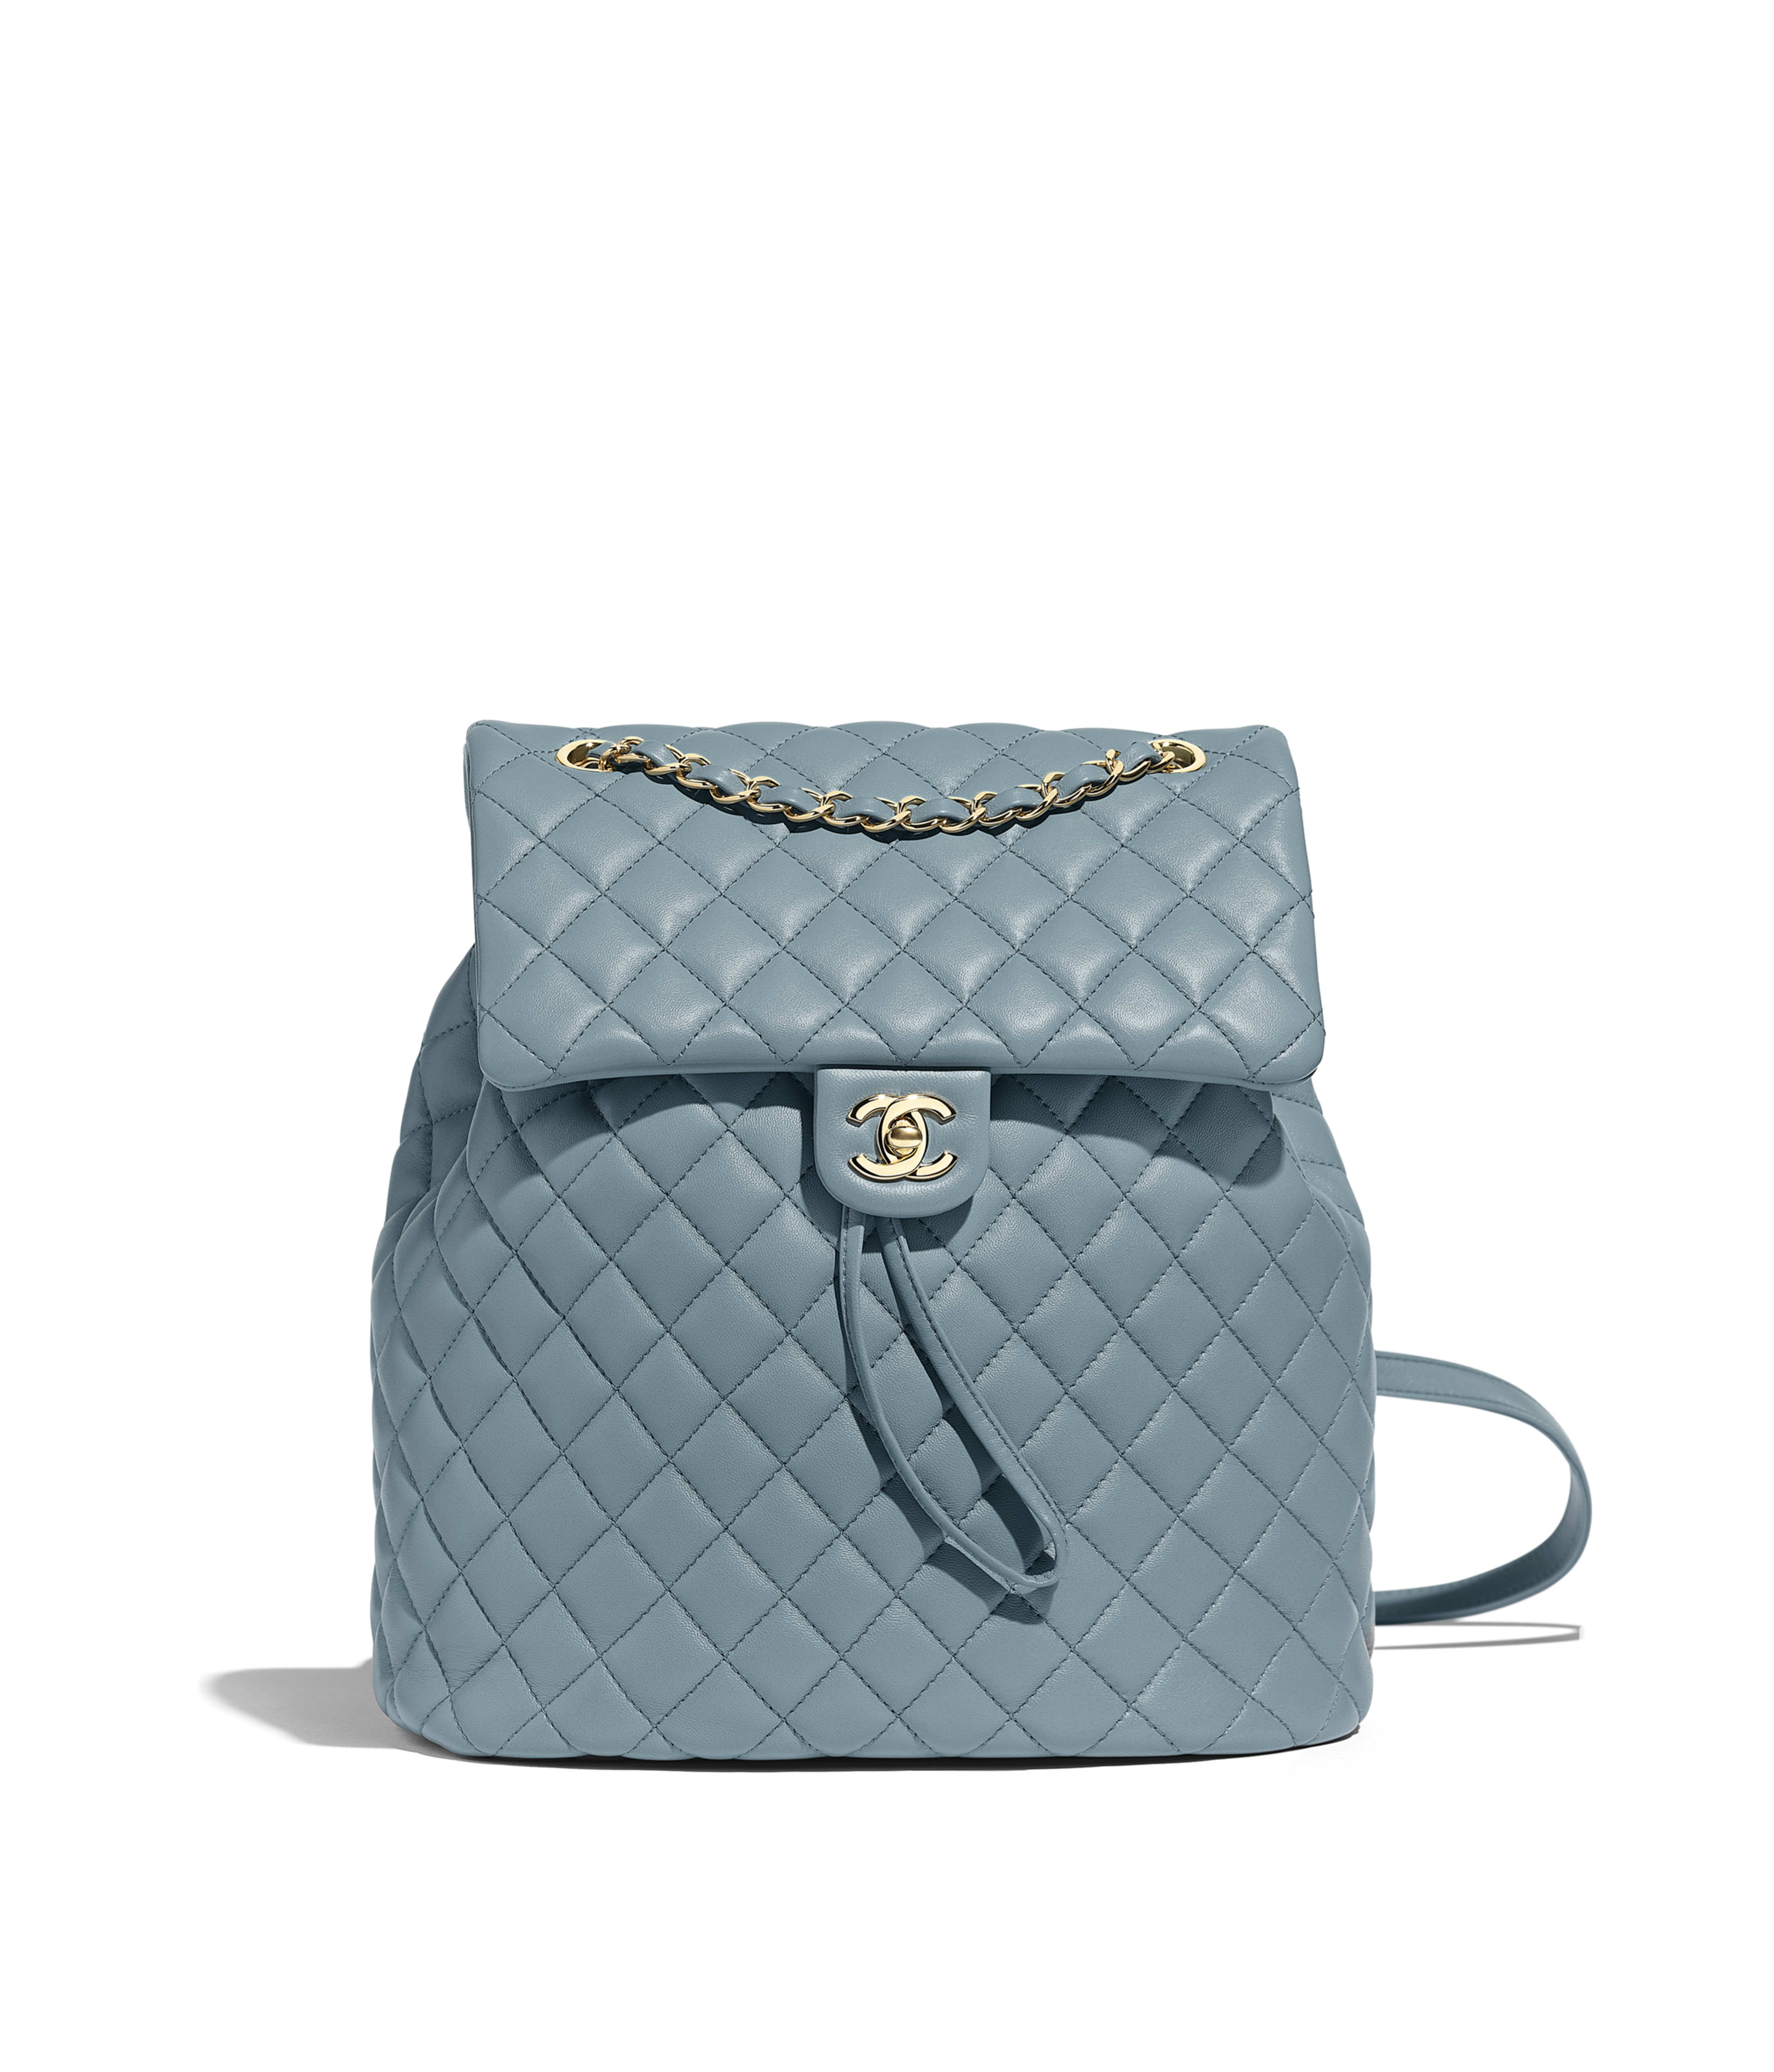 c692d33d2270e5 Backpack Lambskin & Gold-Tone Metal, Blue Ref. A91122B00250N0418